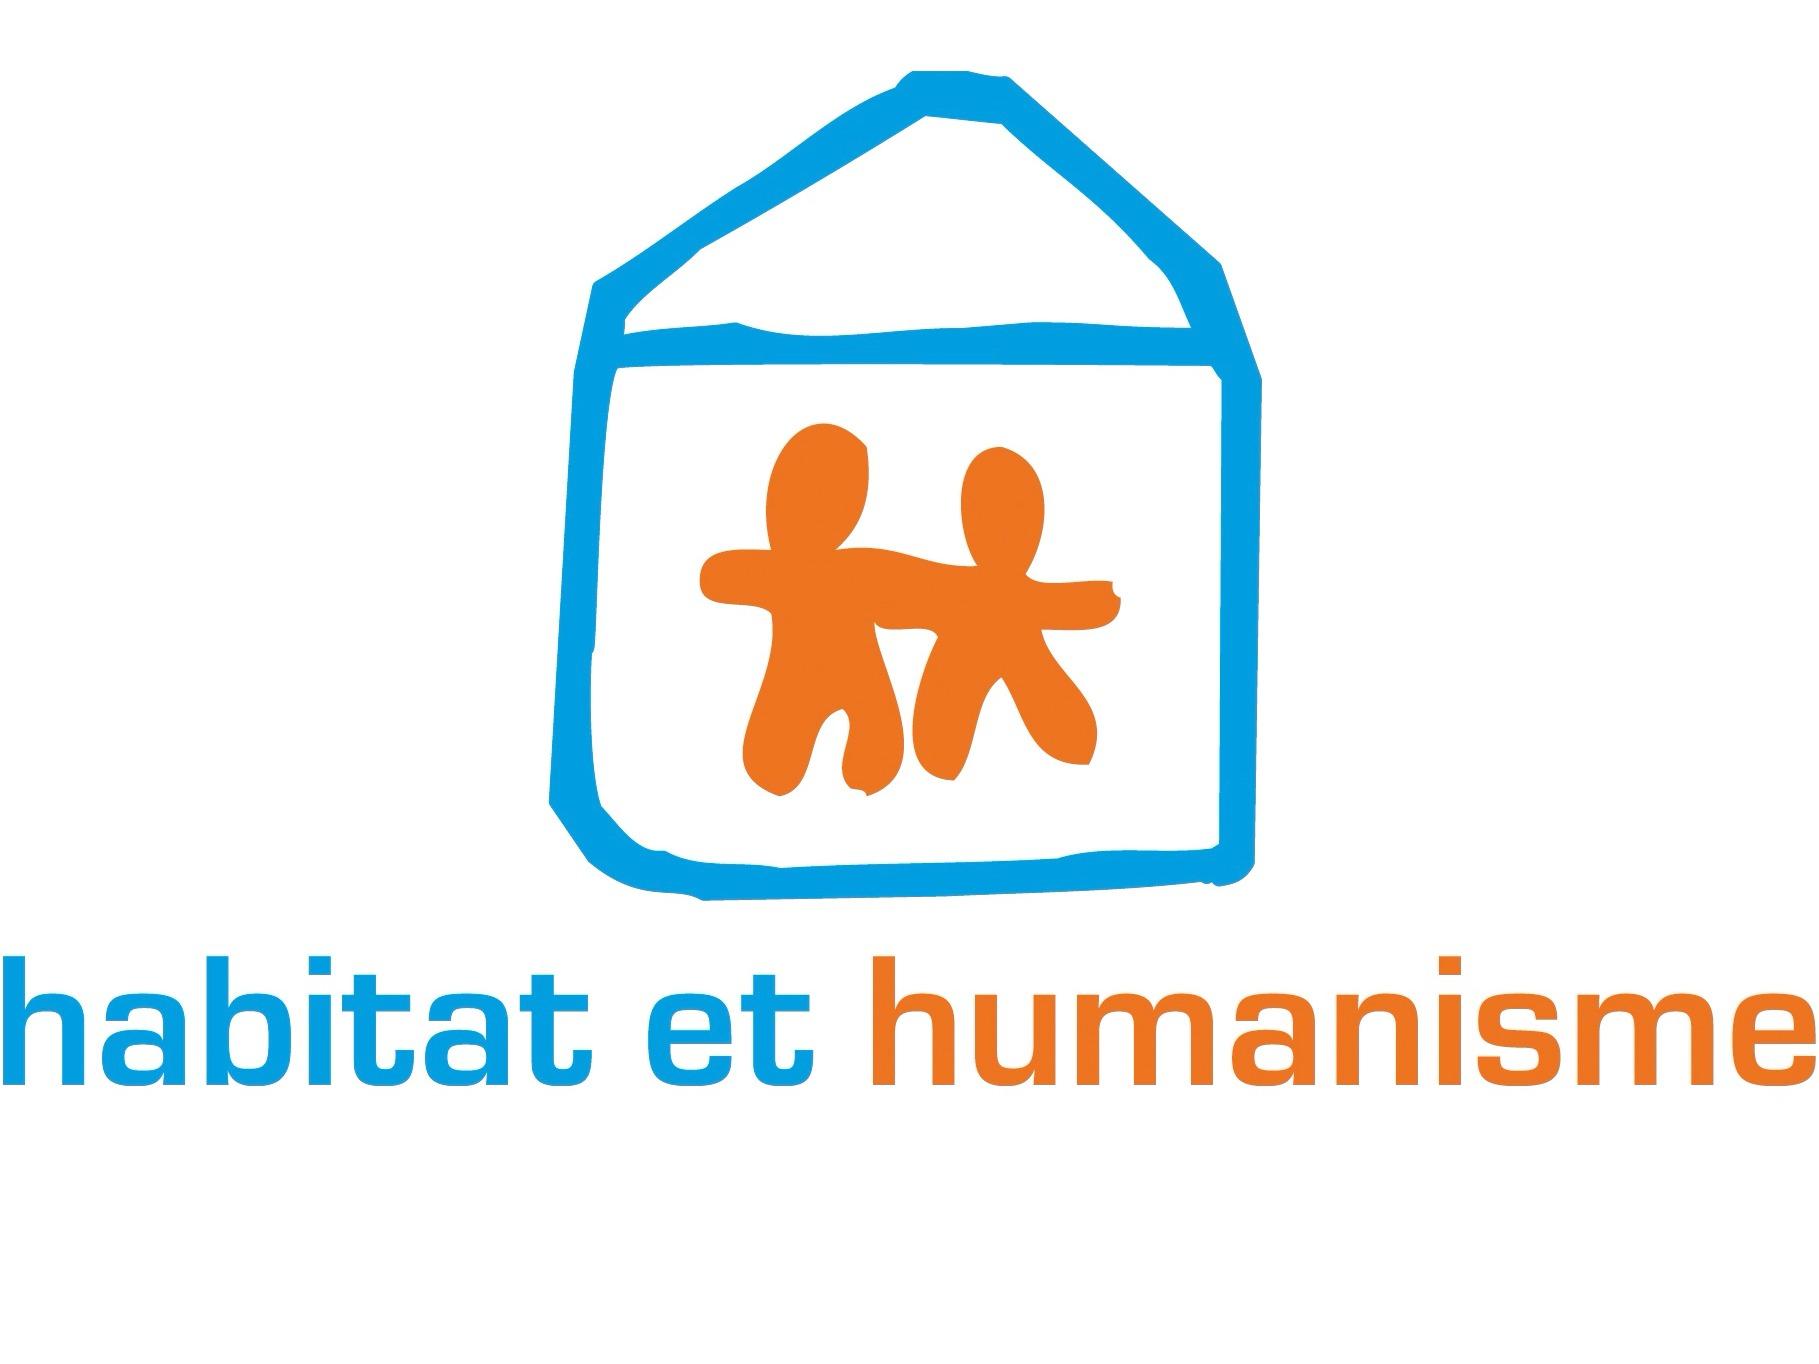 logo habitat et humanisme.jpeg